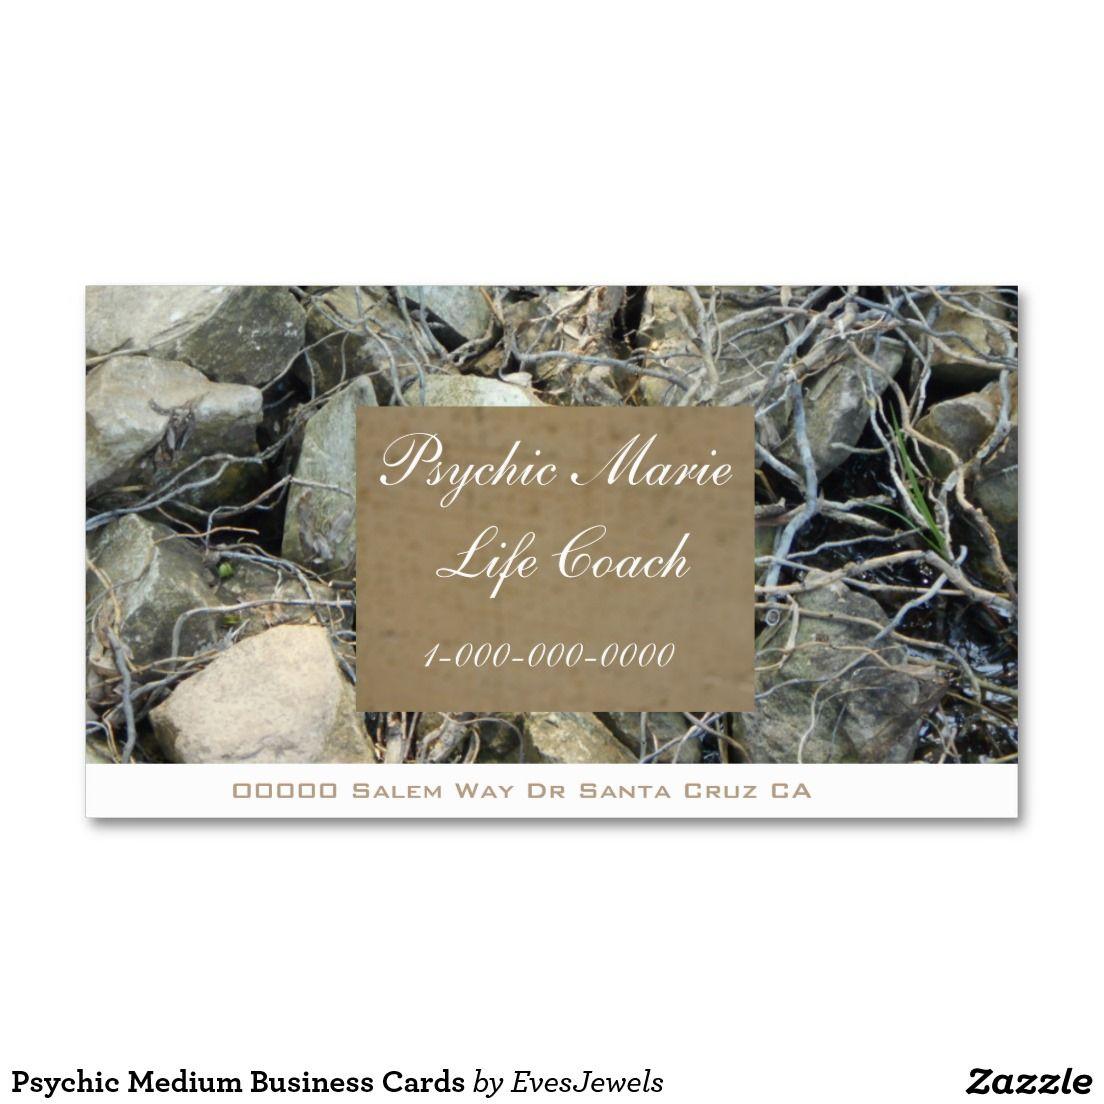 Psychic Medium Business Cards | Business Cards | Pinterest